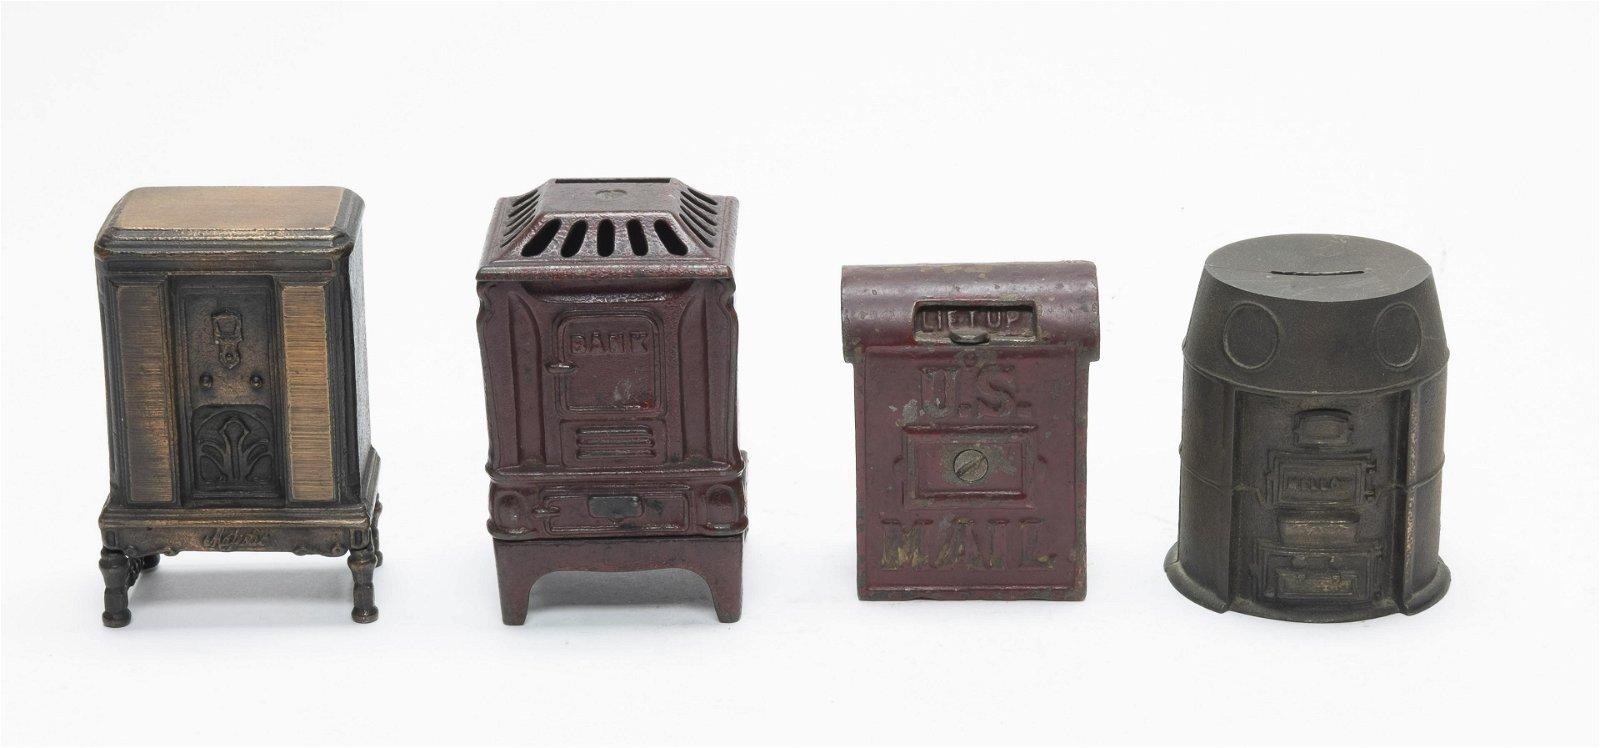 Two Stoves, Mail Box & Radio Iron Banks